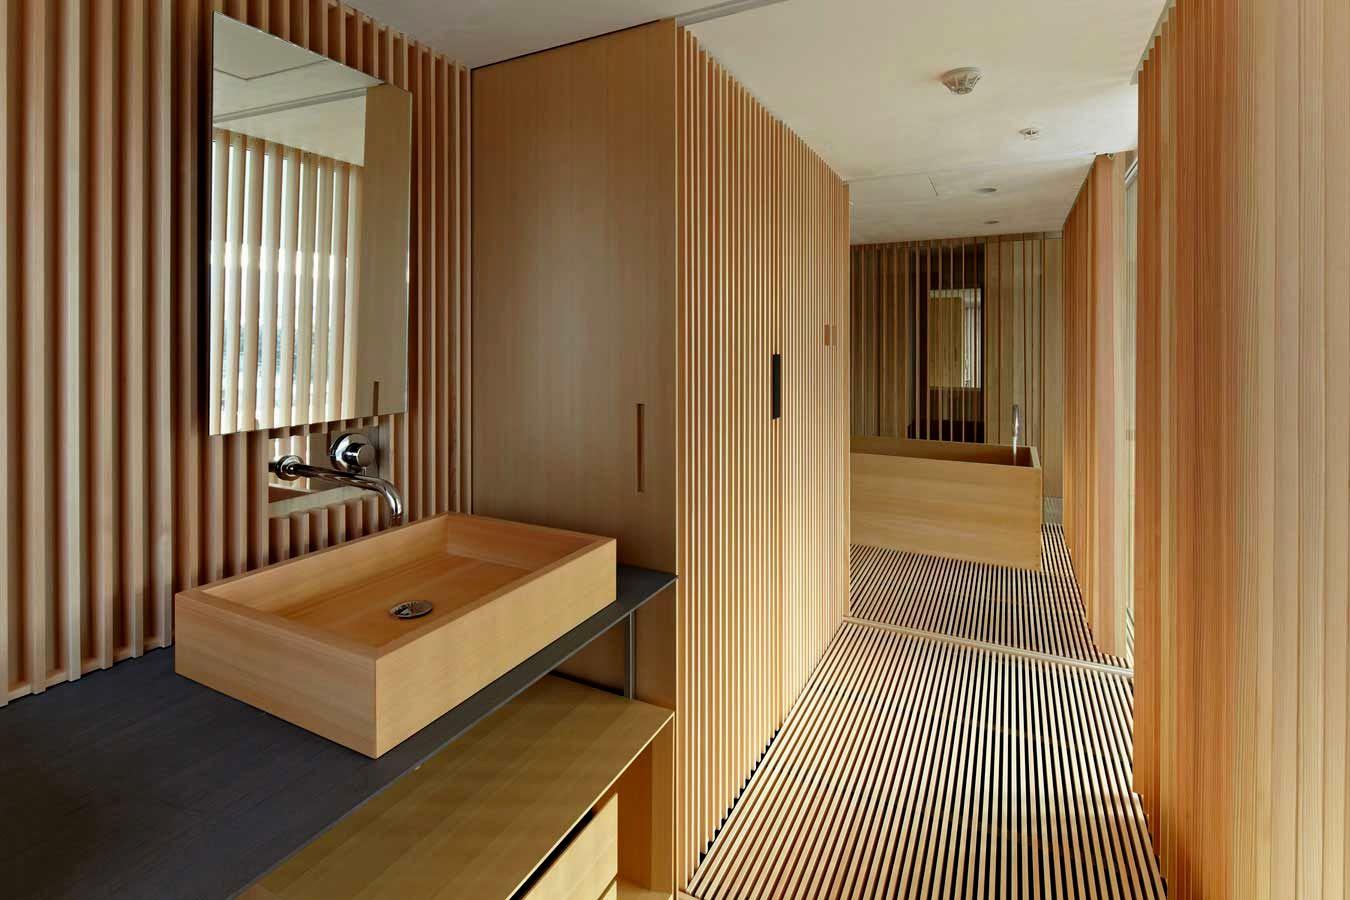 finest tiny bathroom ideas model-Latest Tiny Bathroom Ideas Gallery